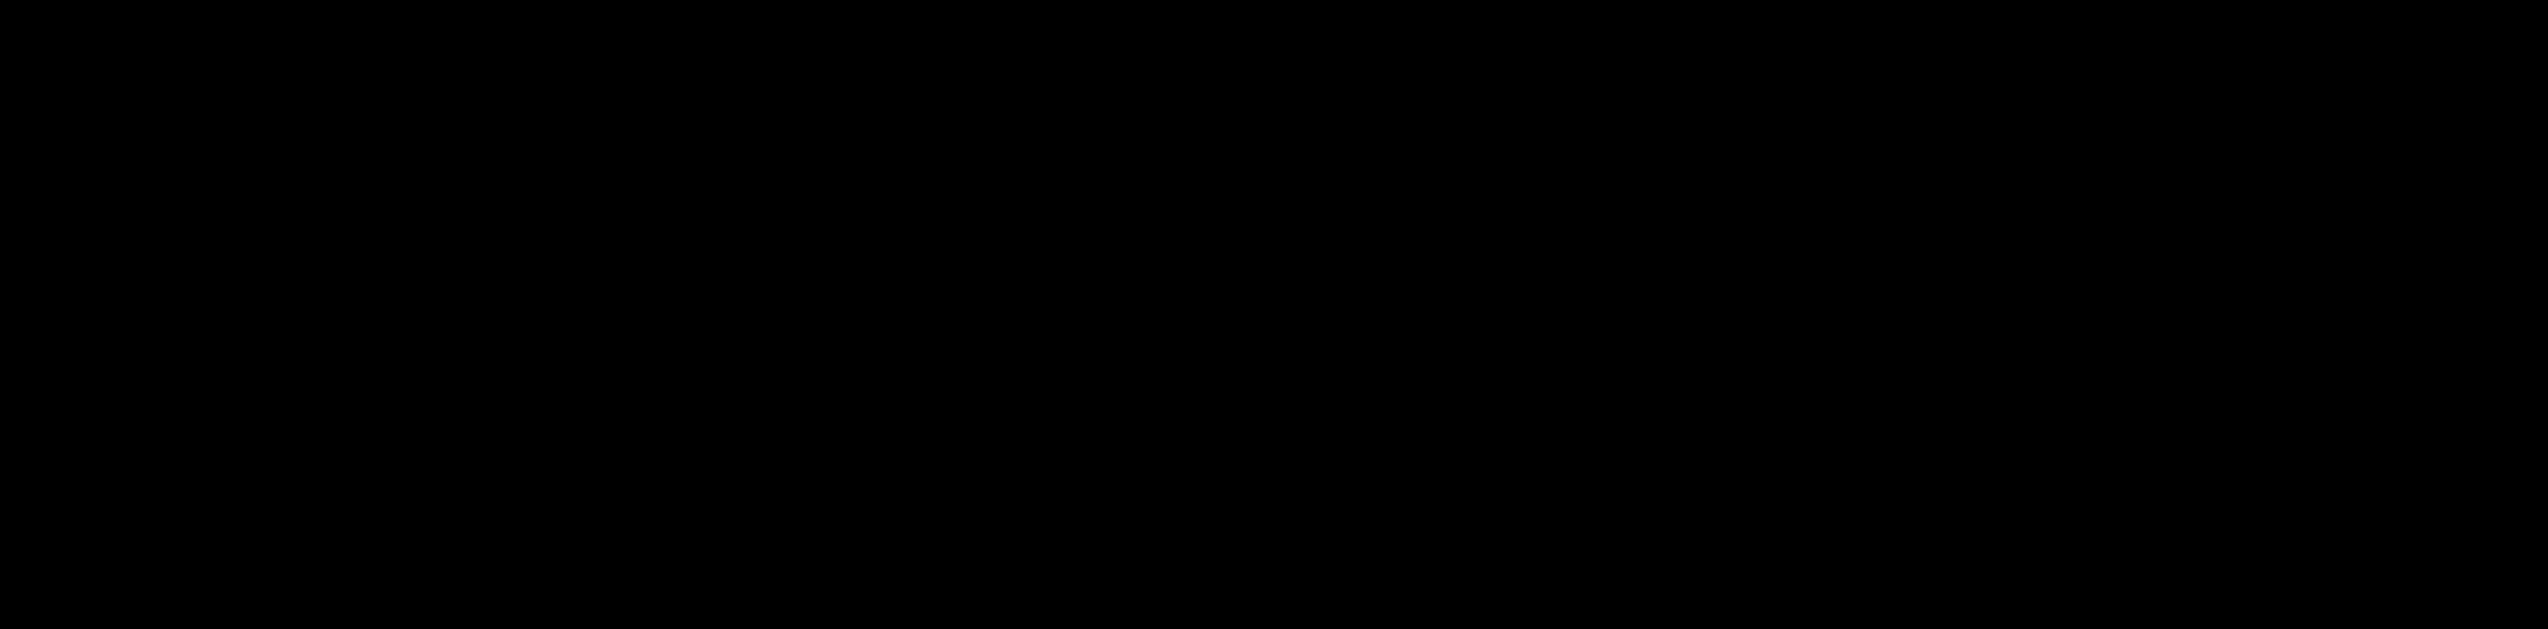 pesto desc-06